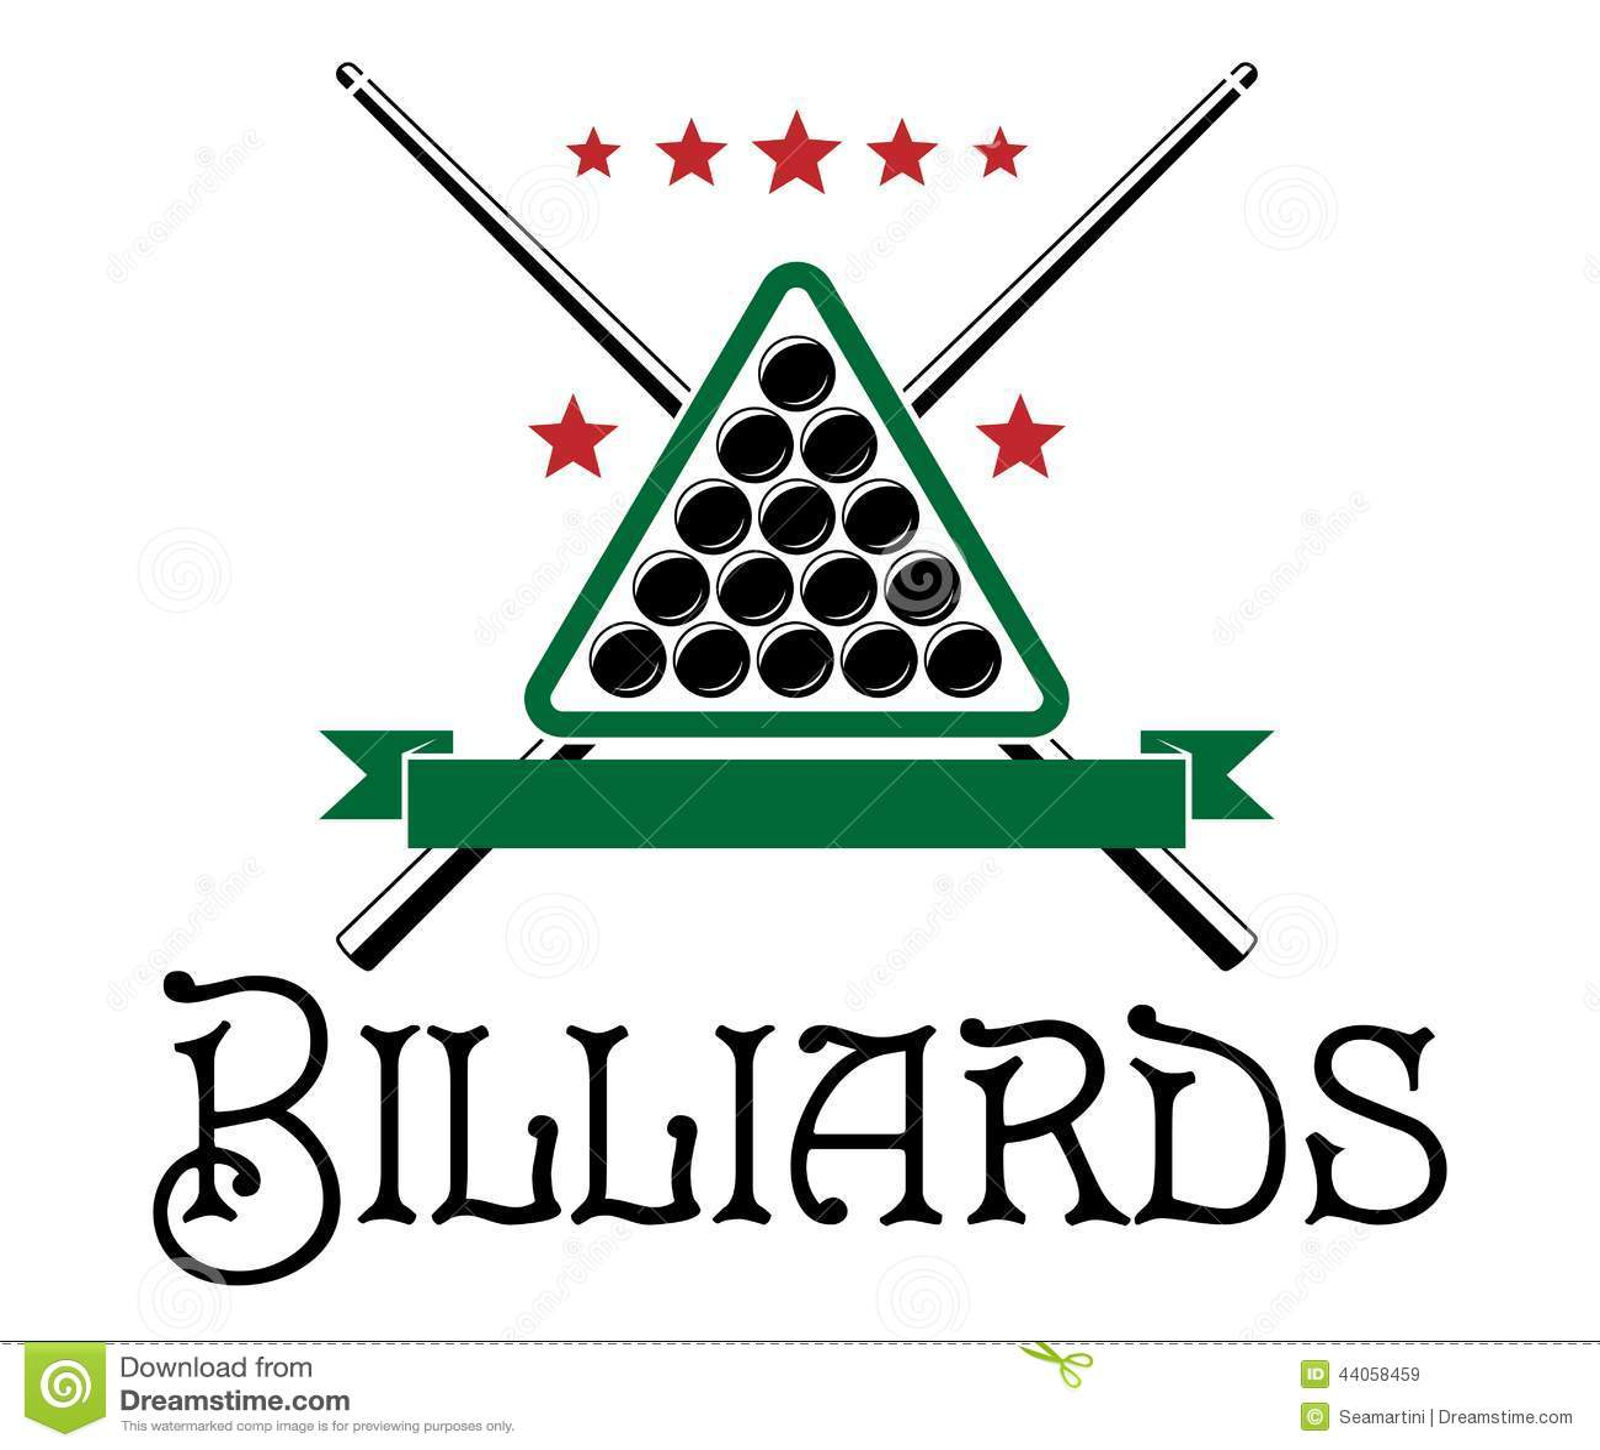 Billiards pool and snooker sport logos set Vector Image   Billiards Logo